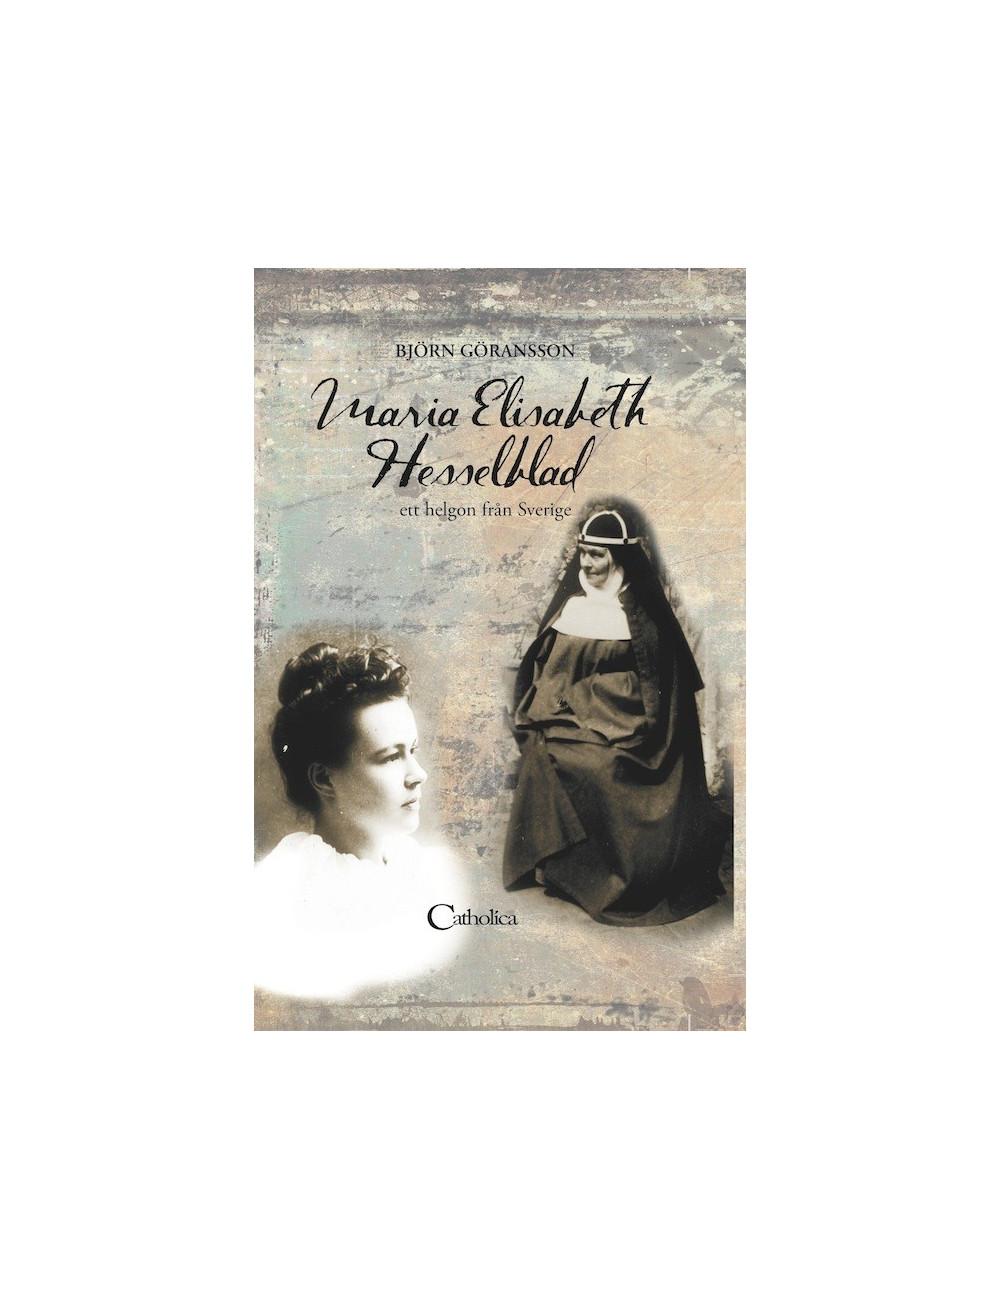 Maria Elisabeth Hesselblad - ett helgon från Sverige